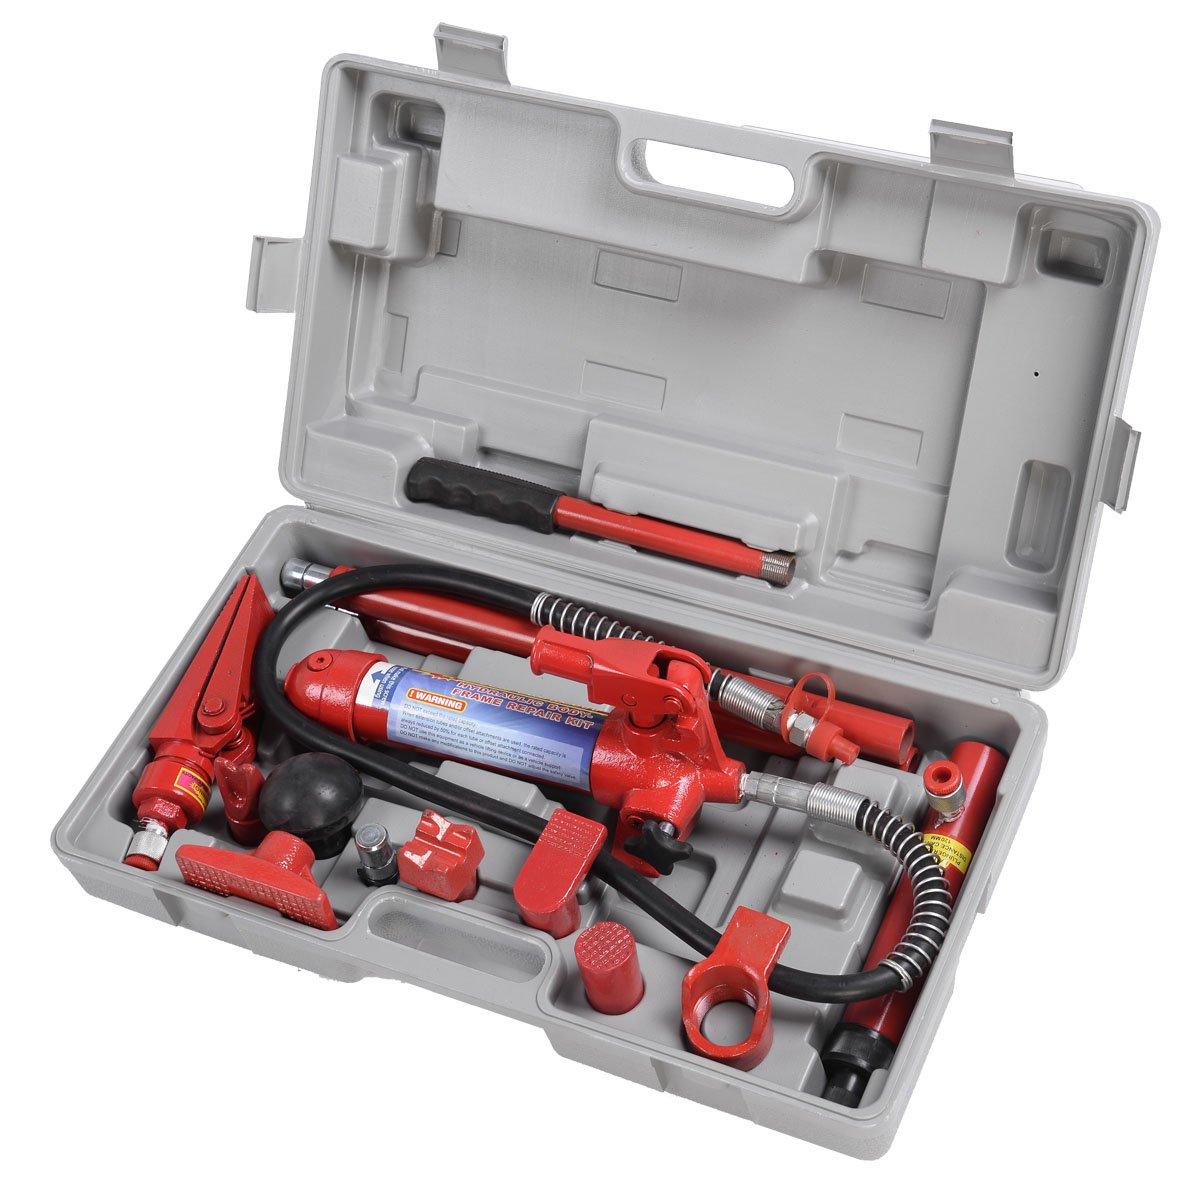 Goplus 4 Ton Porta Power Hydraulic Jack Body Frame Repair Kit Auto Shop Tool Heavy Set w/ Carrying Case